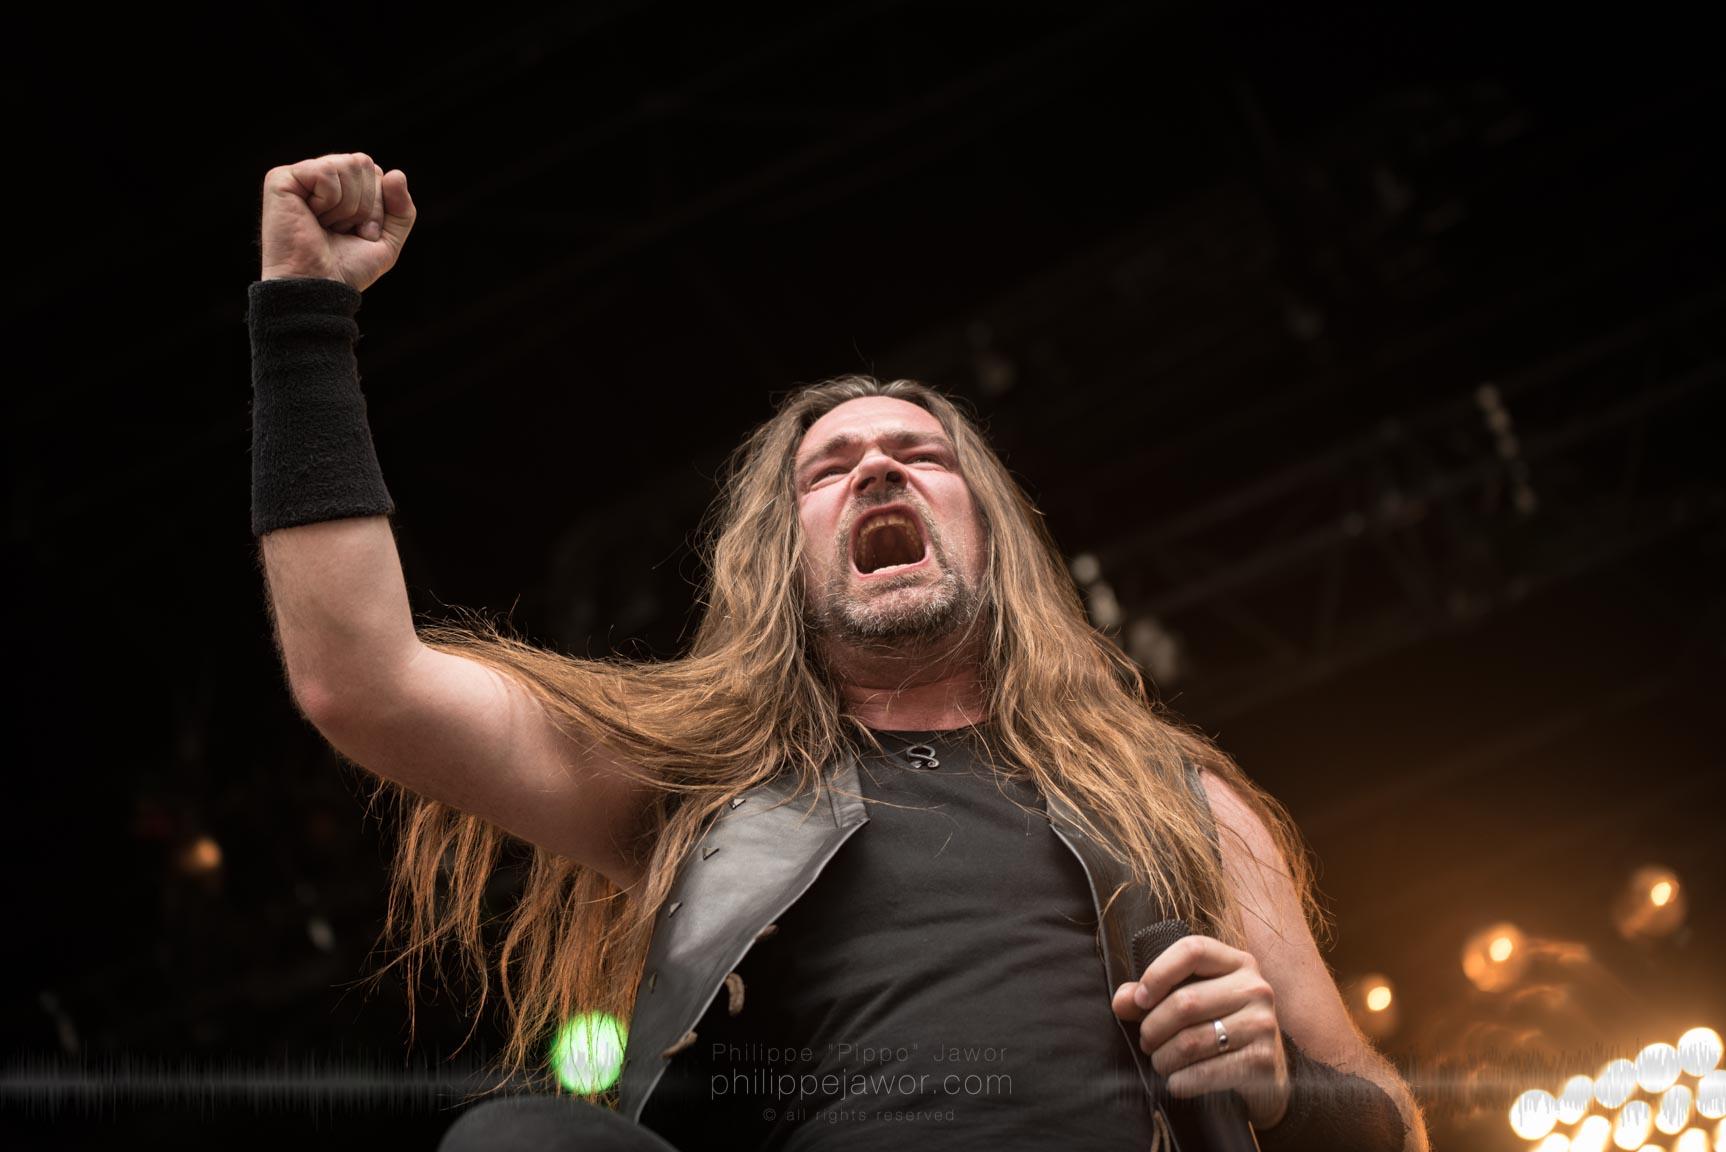 The Dutch folk metal band Heidevolk live at Sylak Open Air festival, Saint Maurice de Gourdans, France, August 2017.  On assignment for Metal Obs' Magazine All rights reserved.